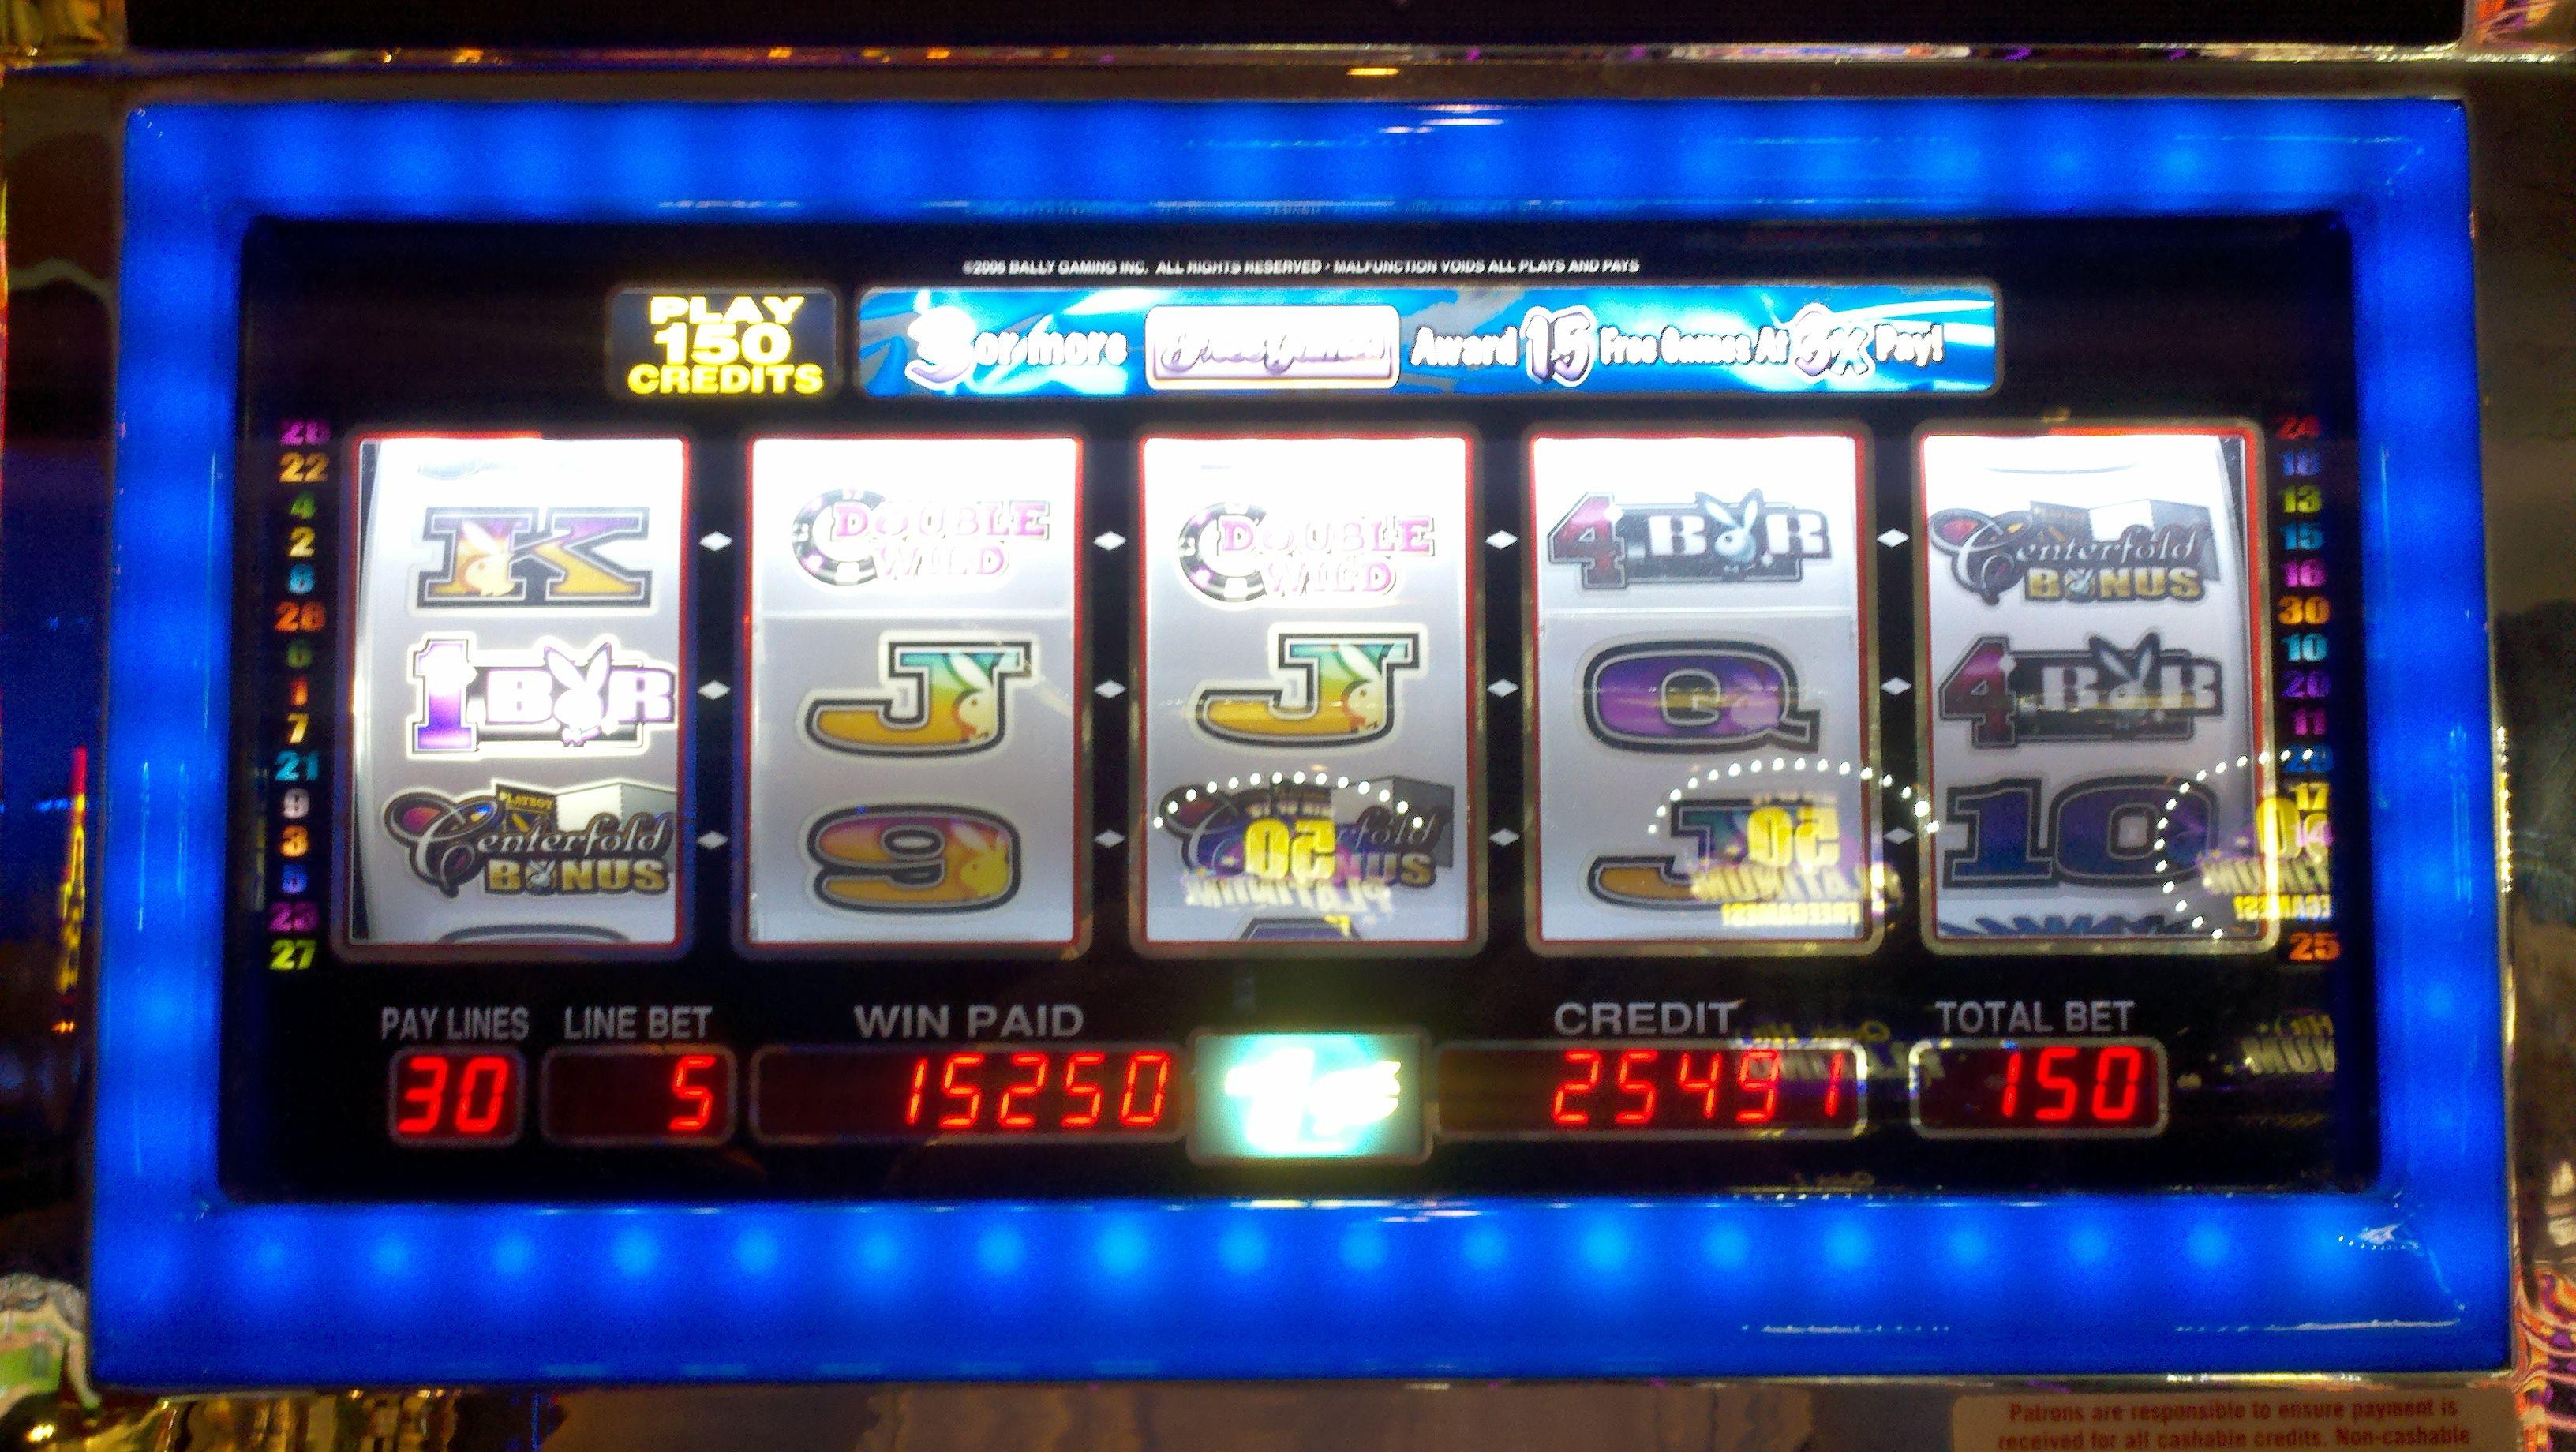 All Slots Casino Payout